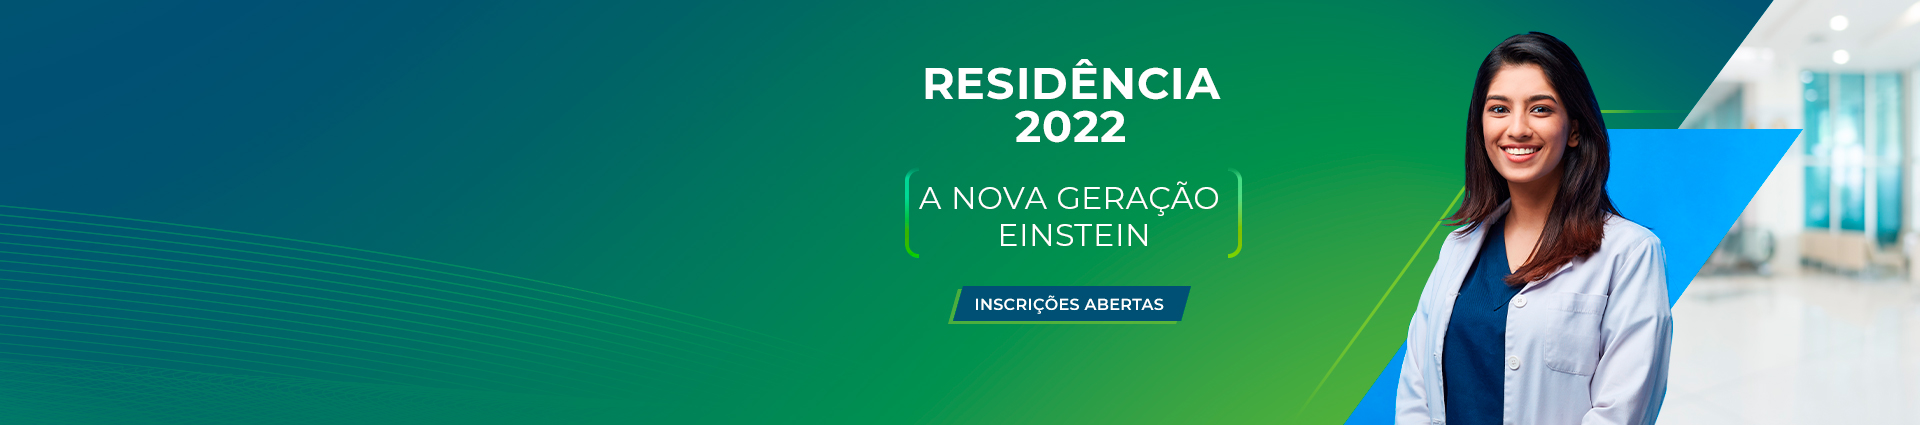 Banner_Residencia2022